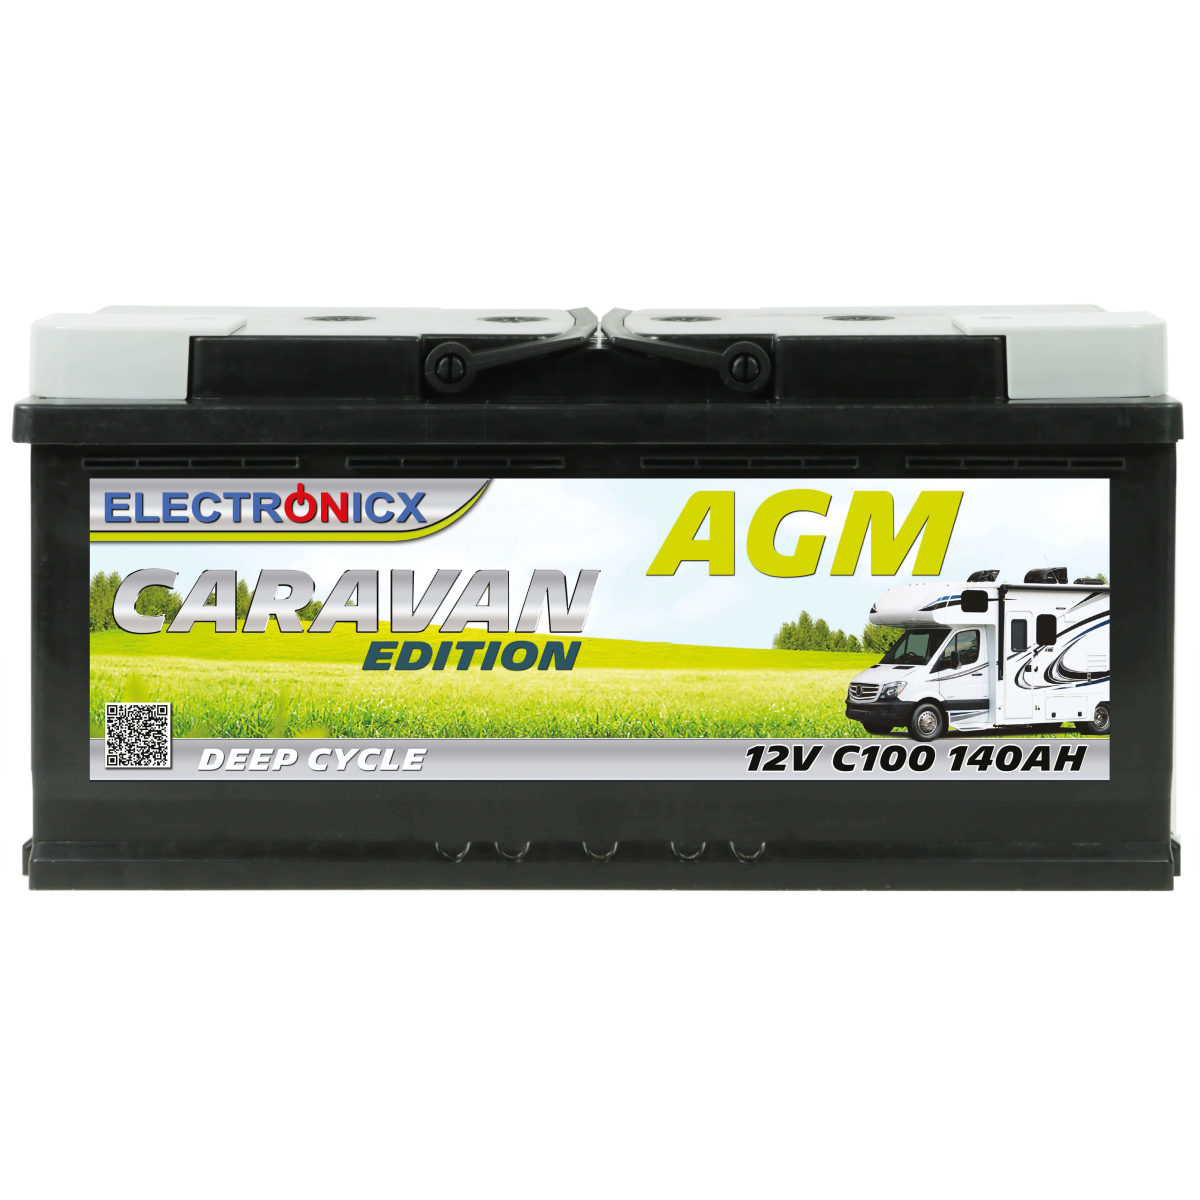 Electronicx Caravan Edition Batterie AGM 140 AH 12V Wohnmobil Boot Versorgung